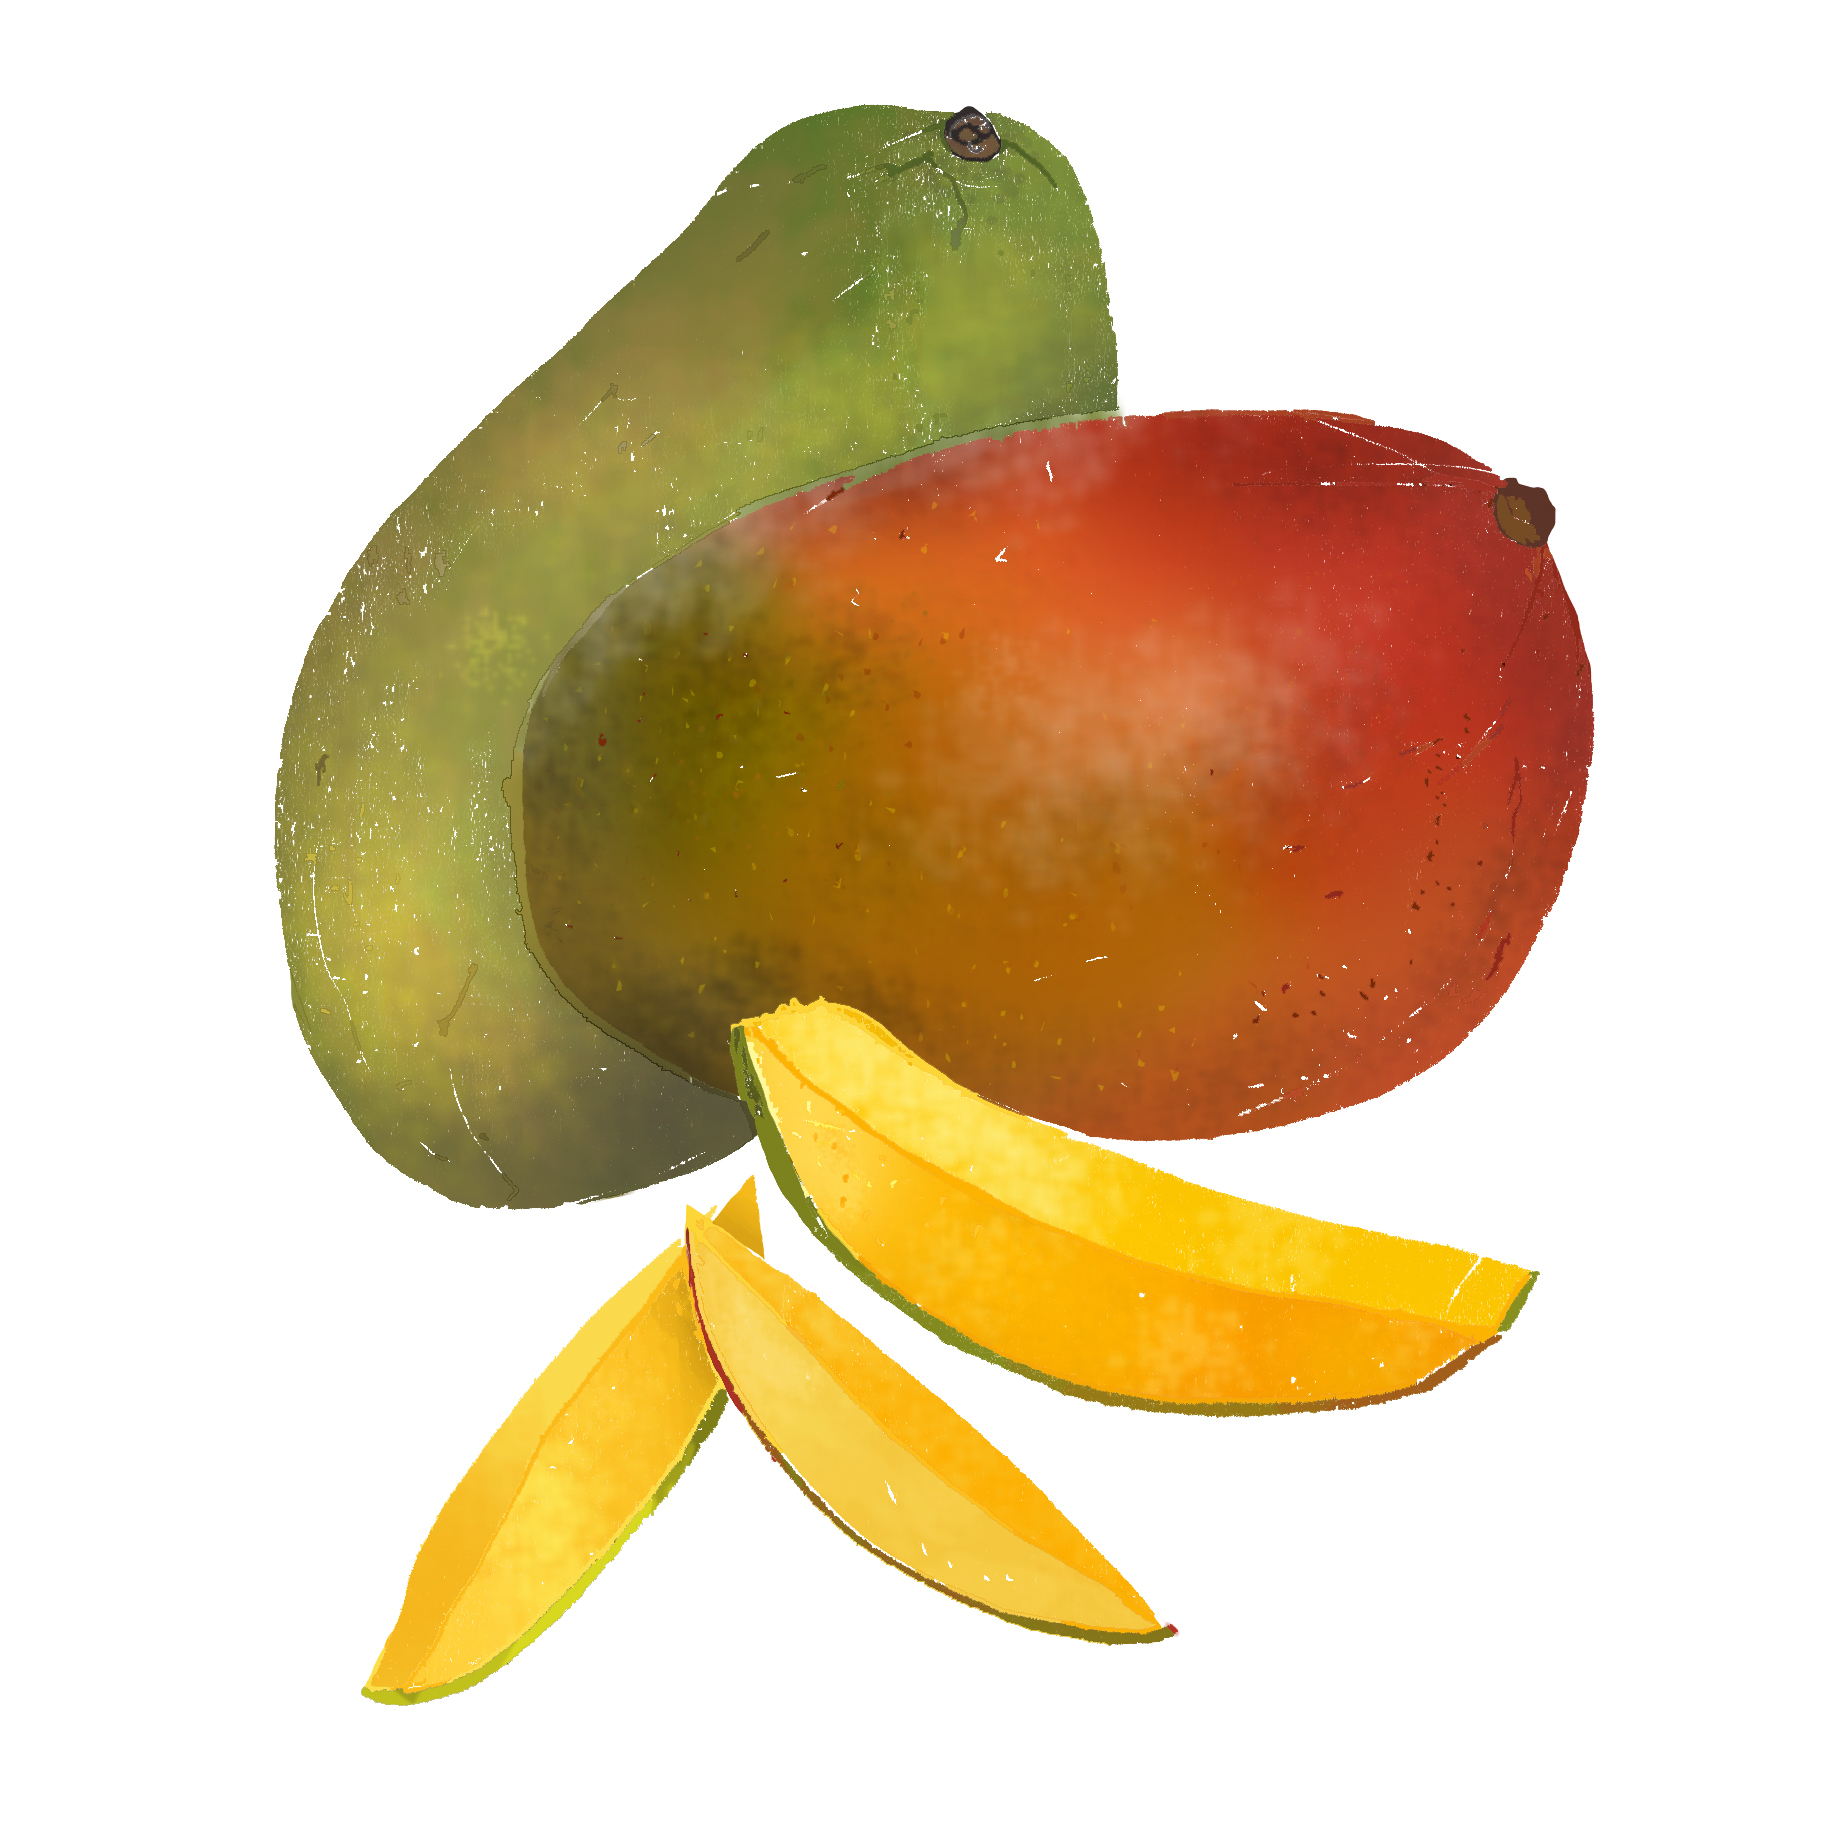 M - Mango